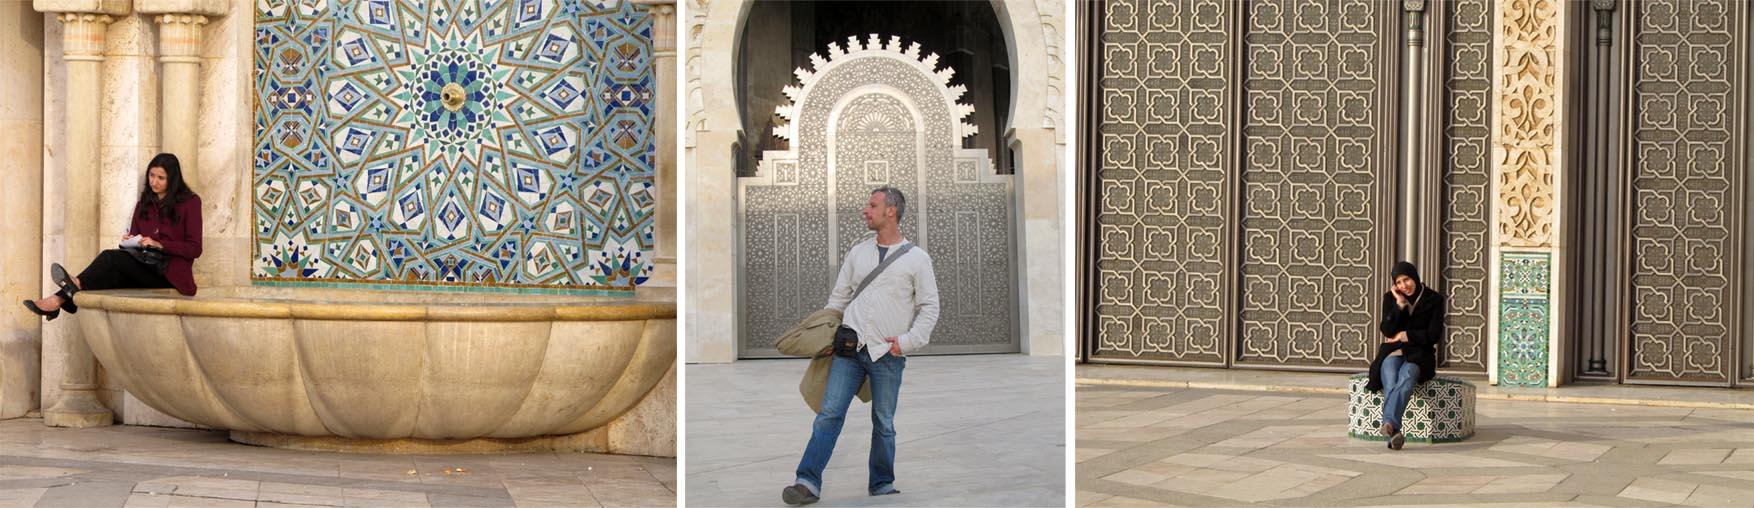 89 maroko kazablanka velika dzamija